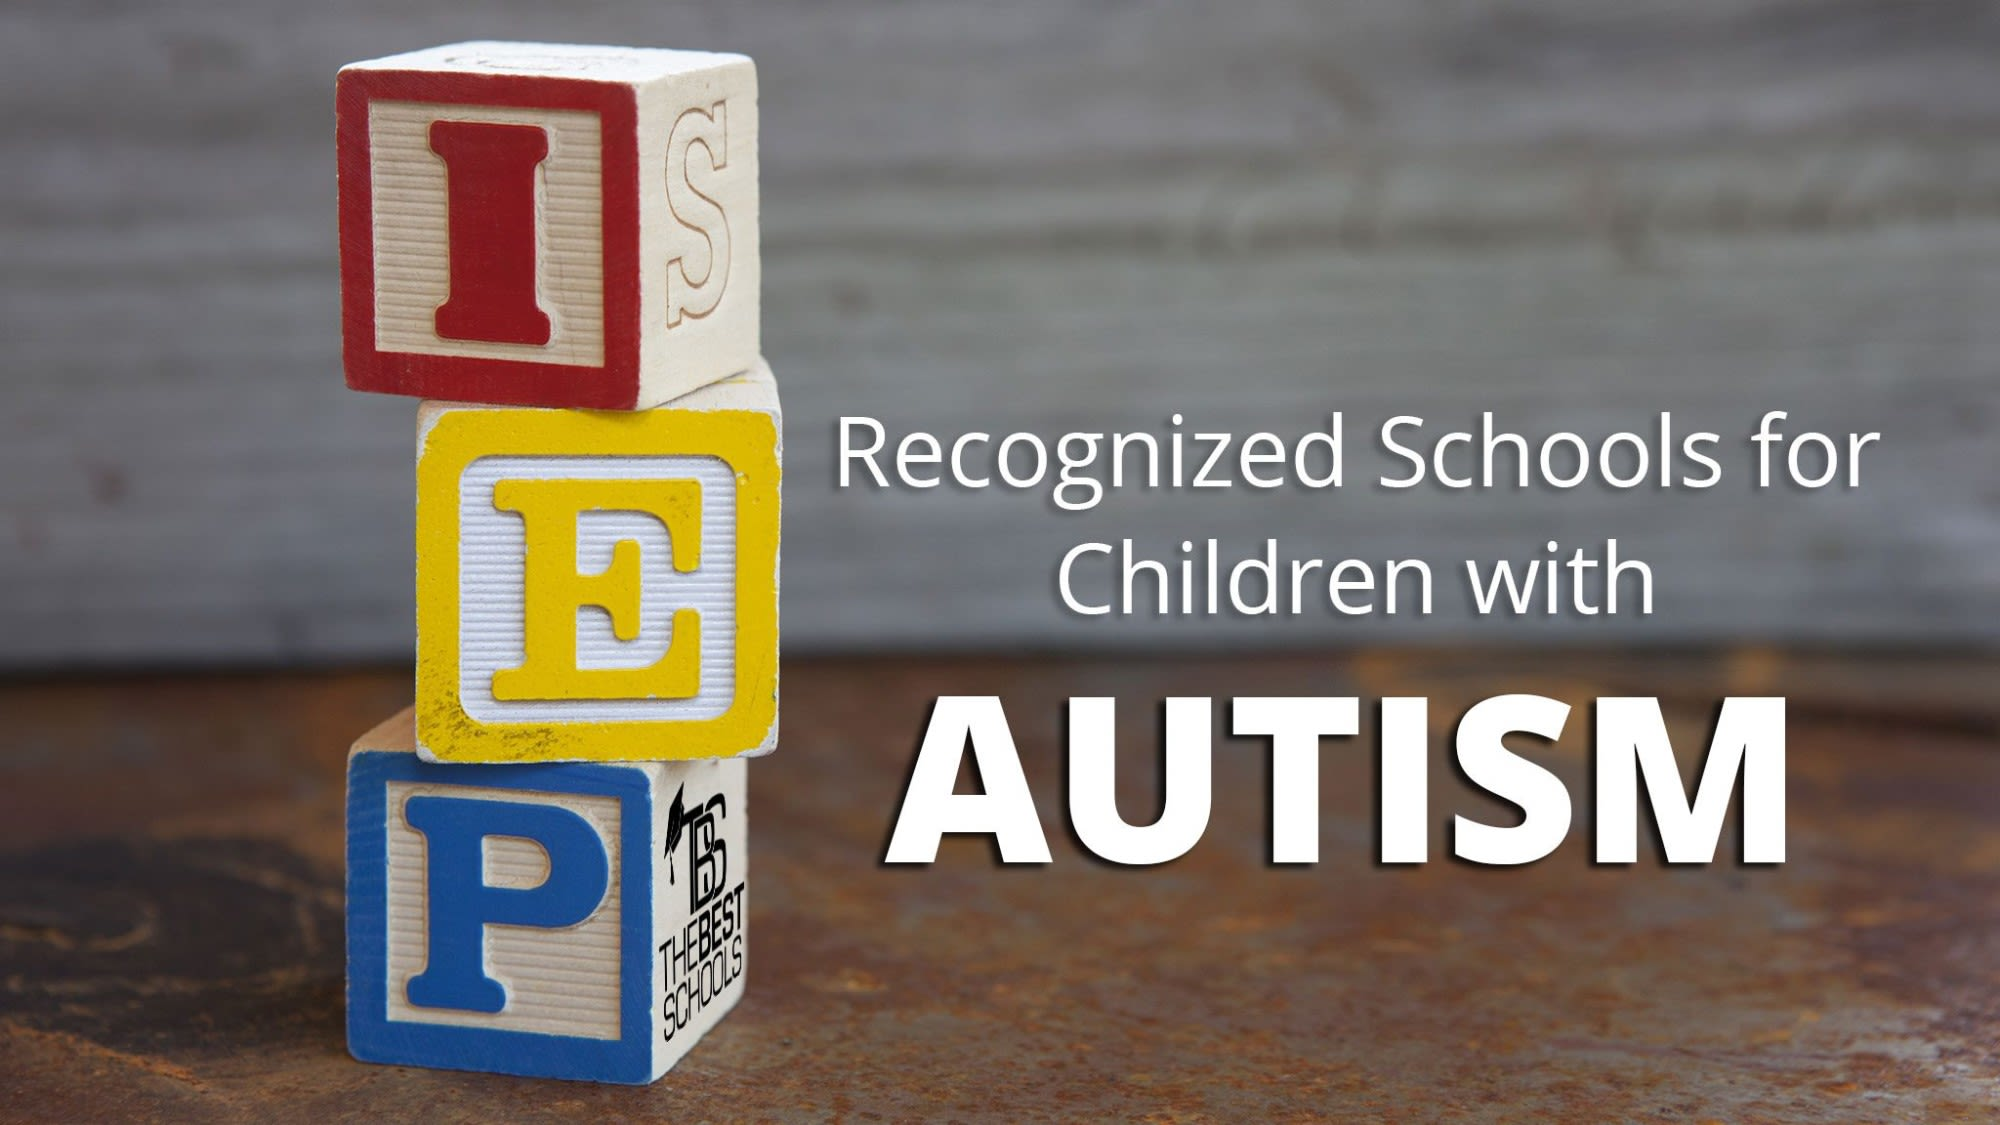 recognized-schools-for-children-with-autism-1.jpg